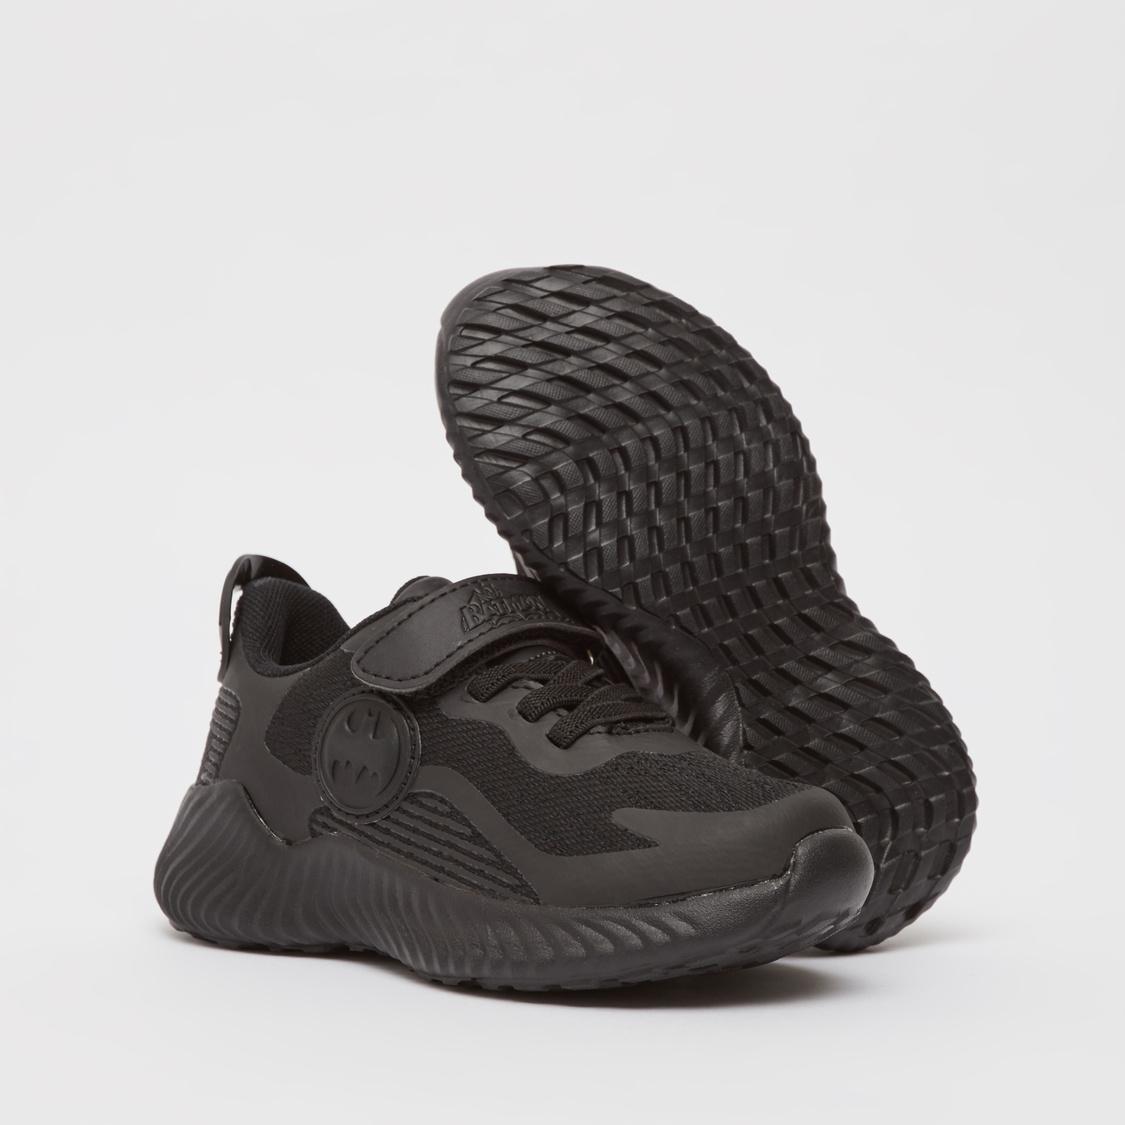 Batman Embossed Shoes with Hook and Loop Closure